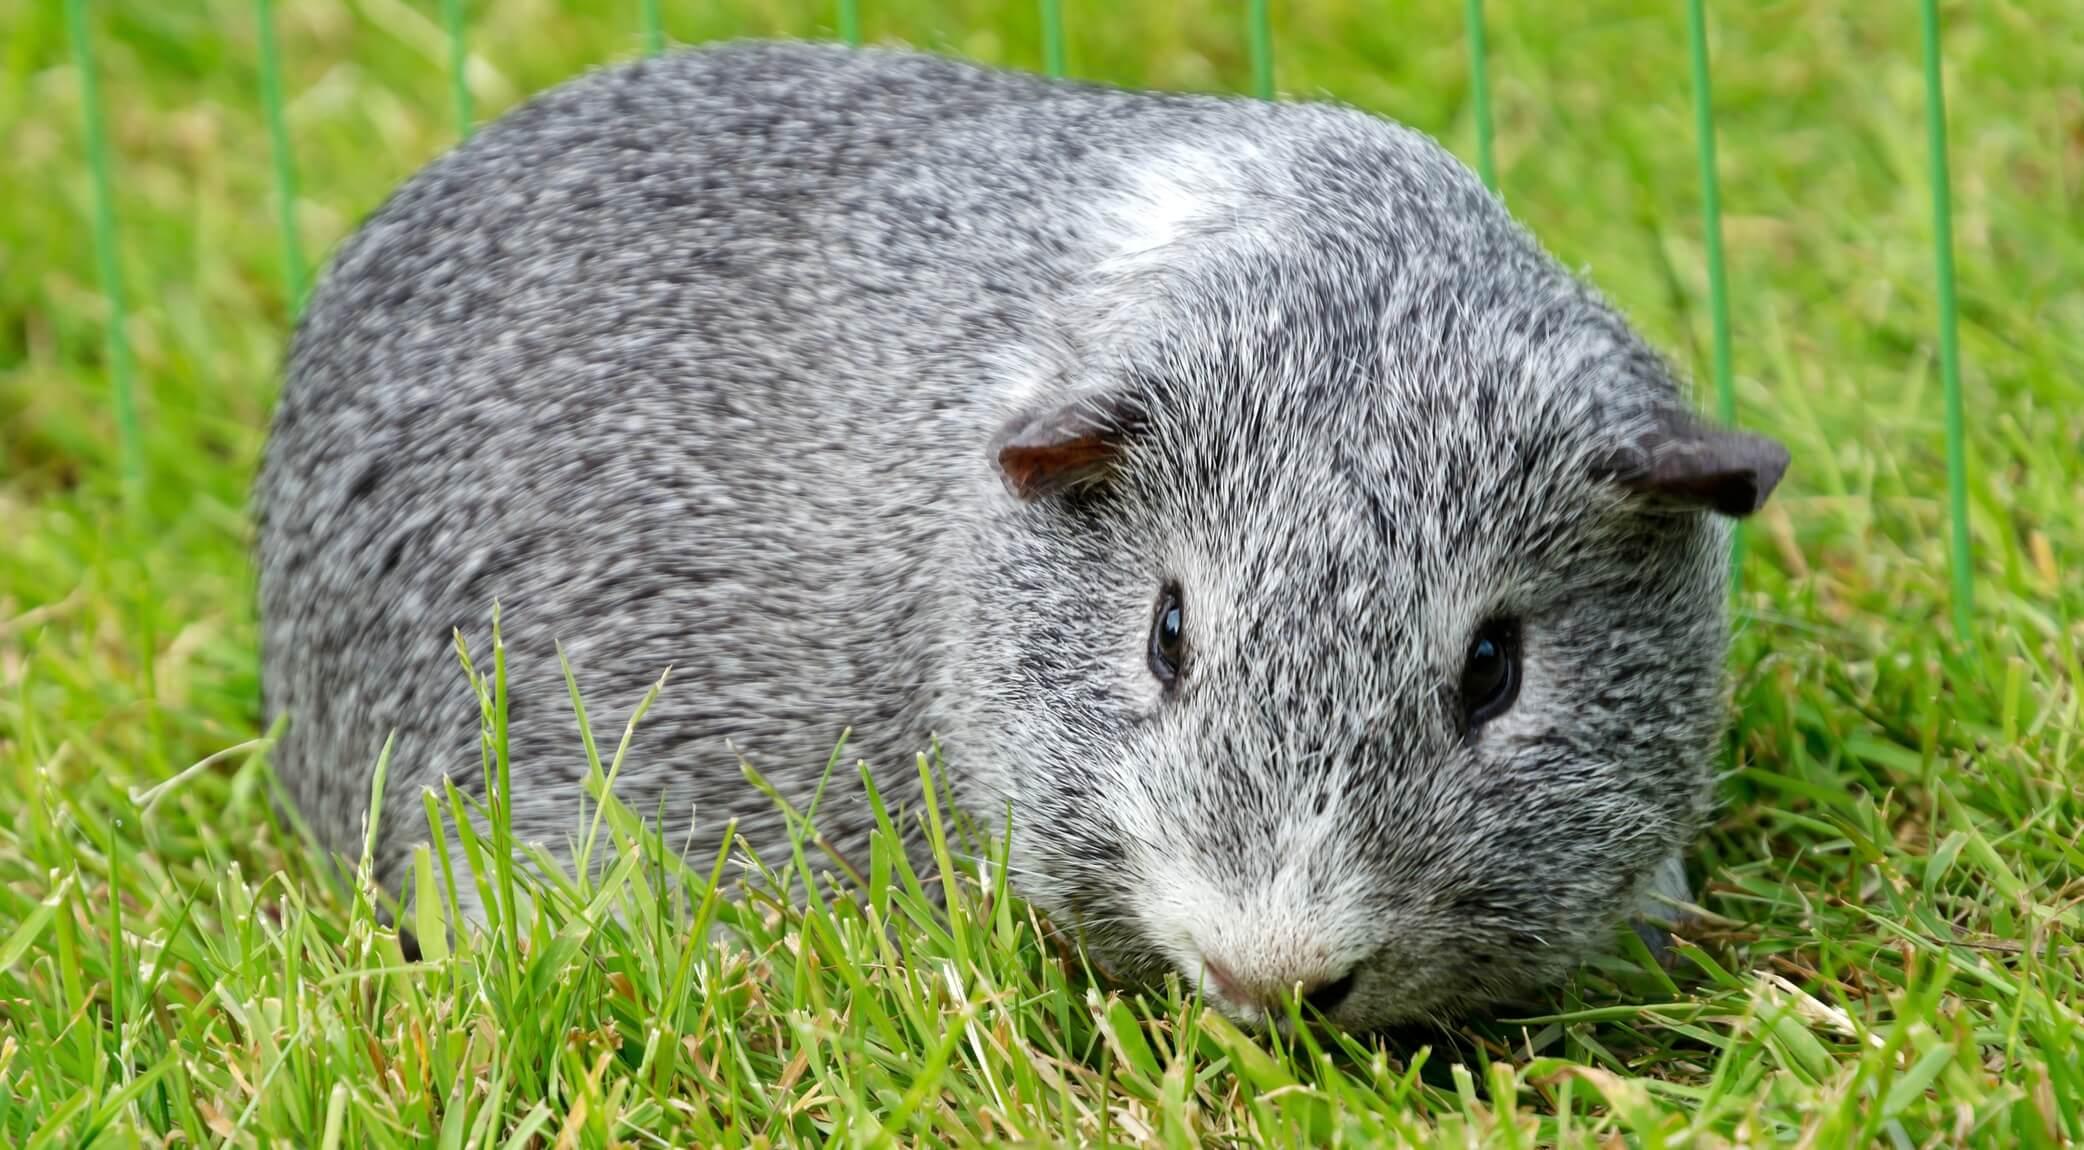 Профилактика заболеваний у морских свинок